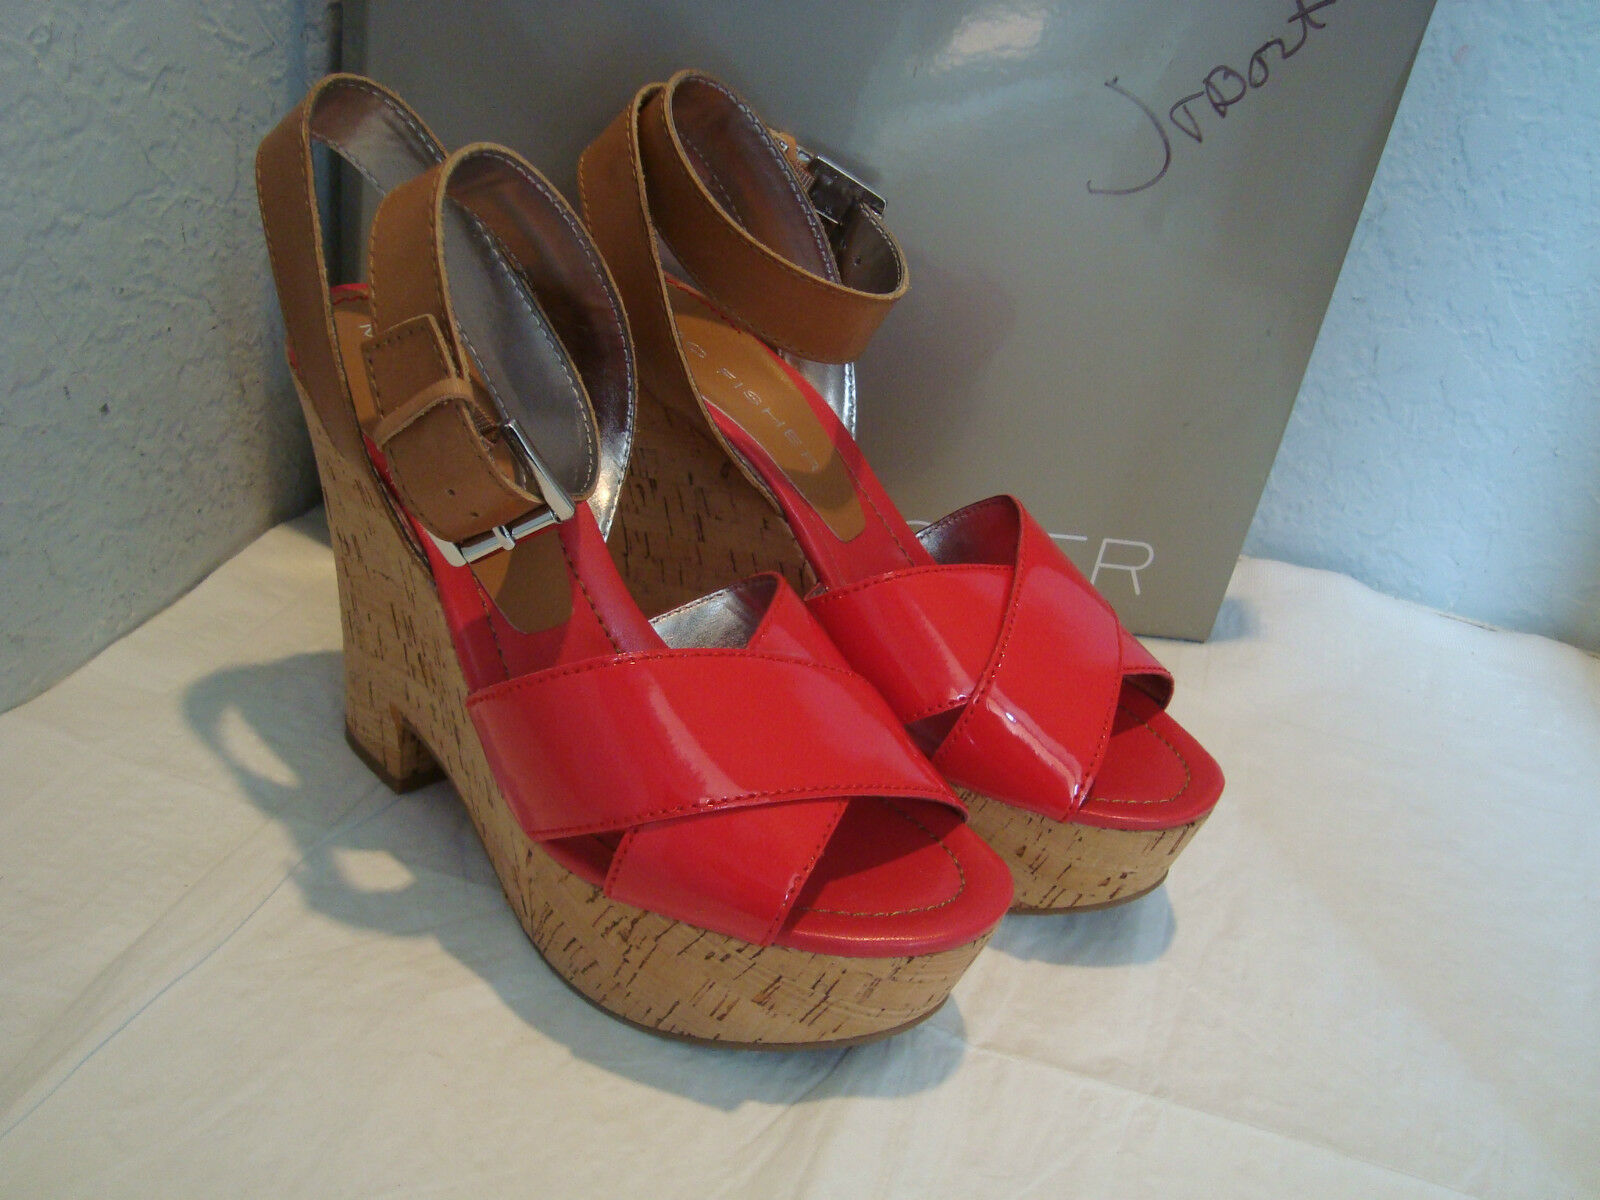 NOUVEAU MARC FISHER FEMME Sabina Orange Sanguine en en en Cuir Compensées Sandales Chaussures 9.5 Med b2dc4f